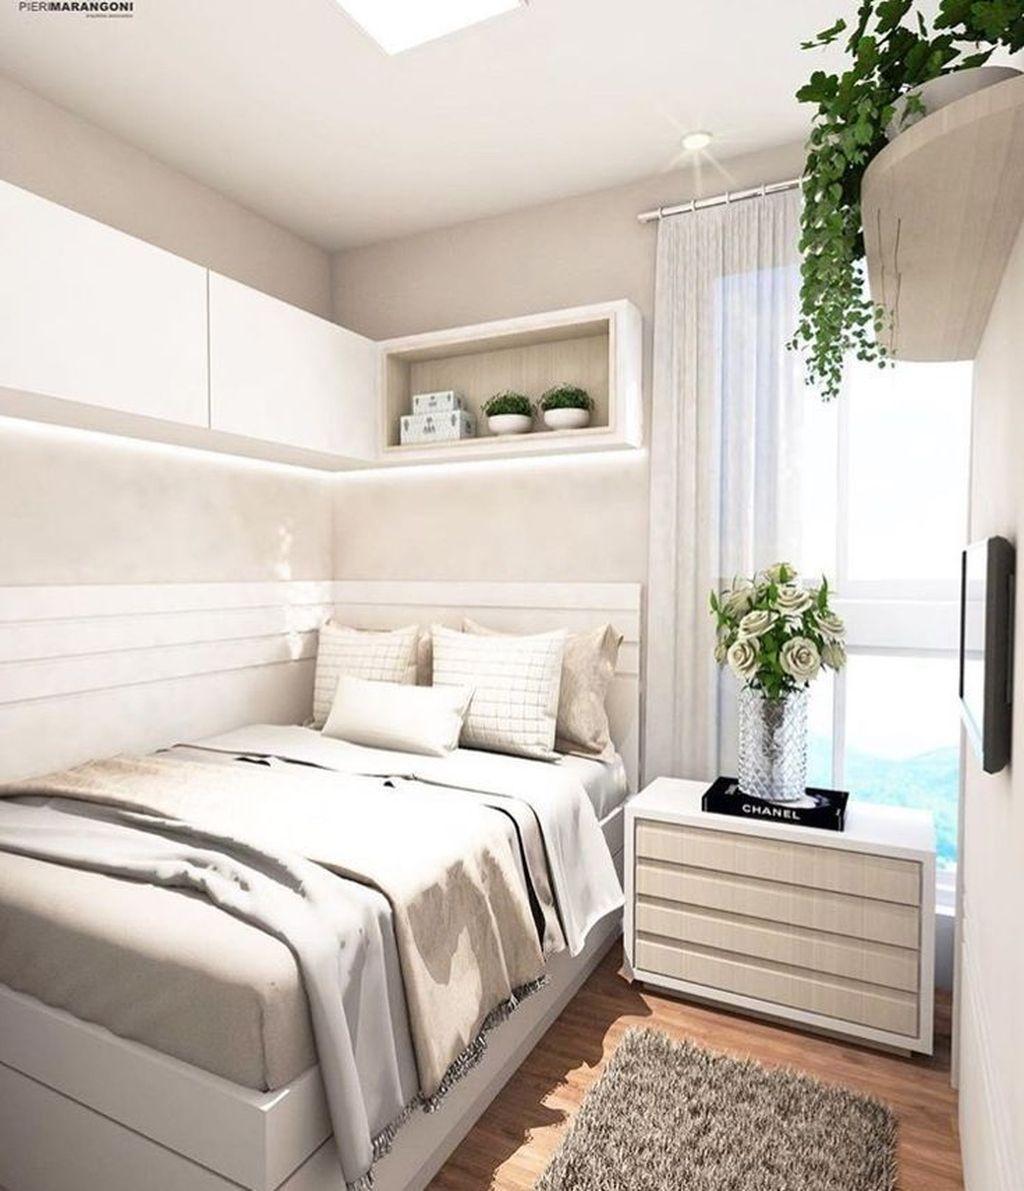 33 Admirable Small Bedroom Decor Ideas You Never Seen Before Homyhomee Small Bedroom Decor Tiny Bedroom Design Small Room Bedroom